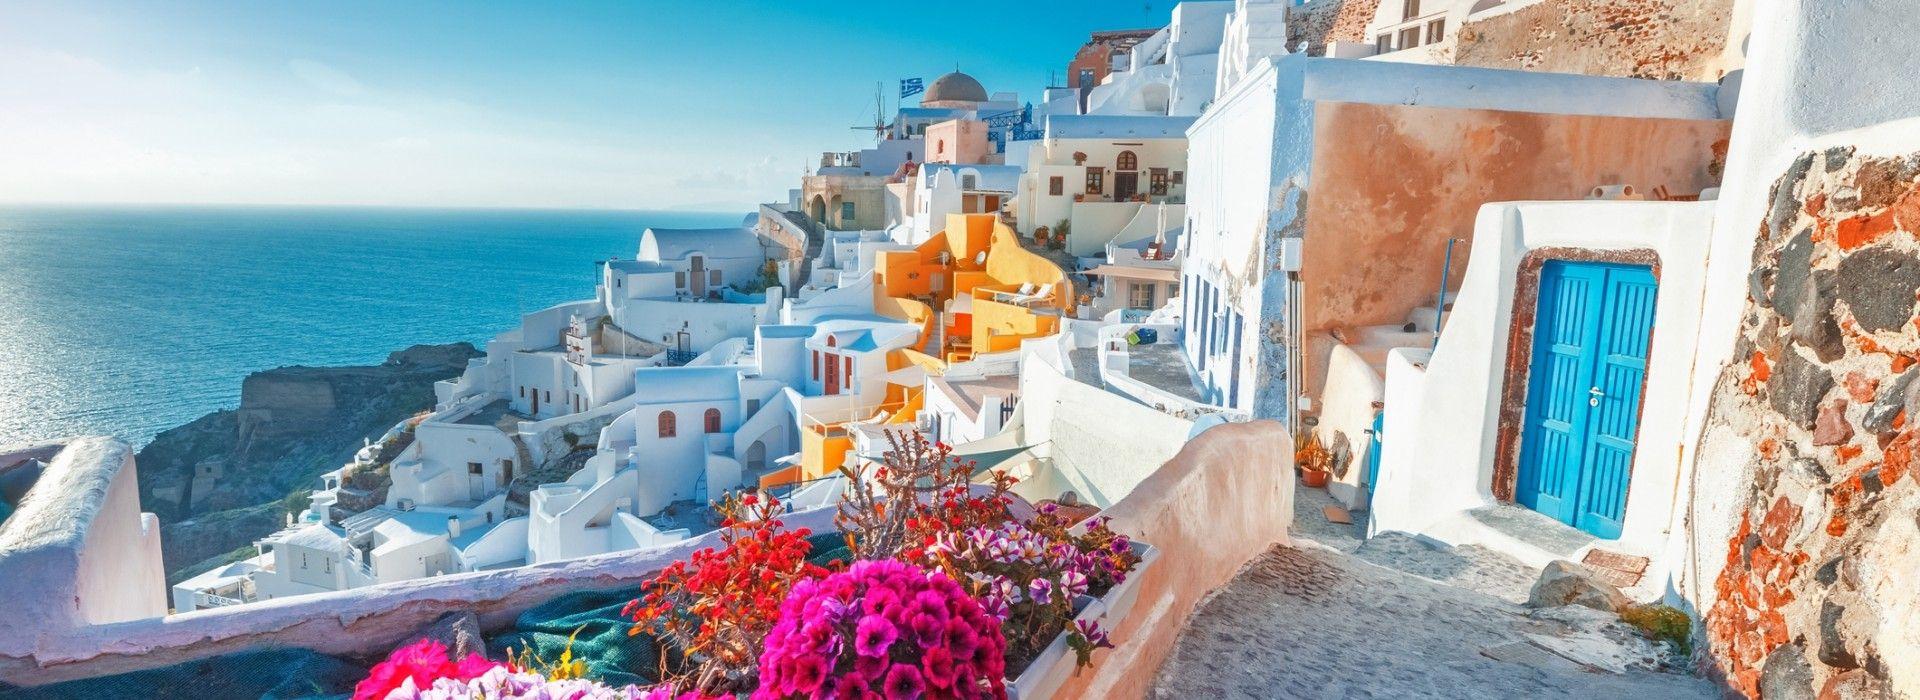 Explorer Tours in Mediterranean